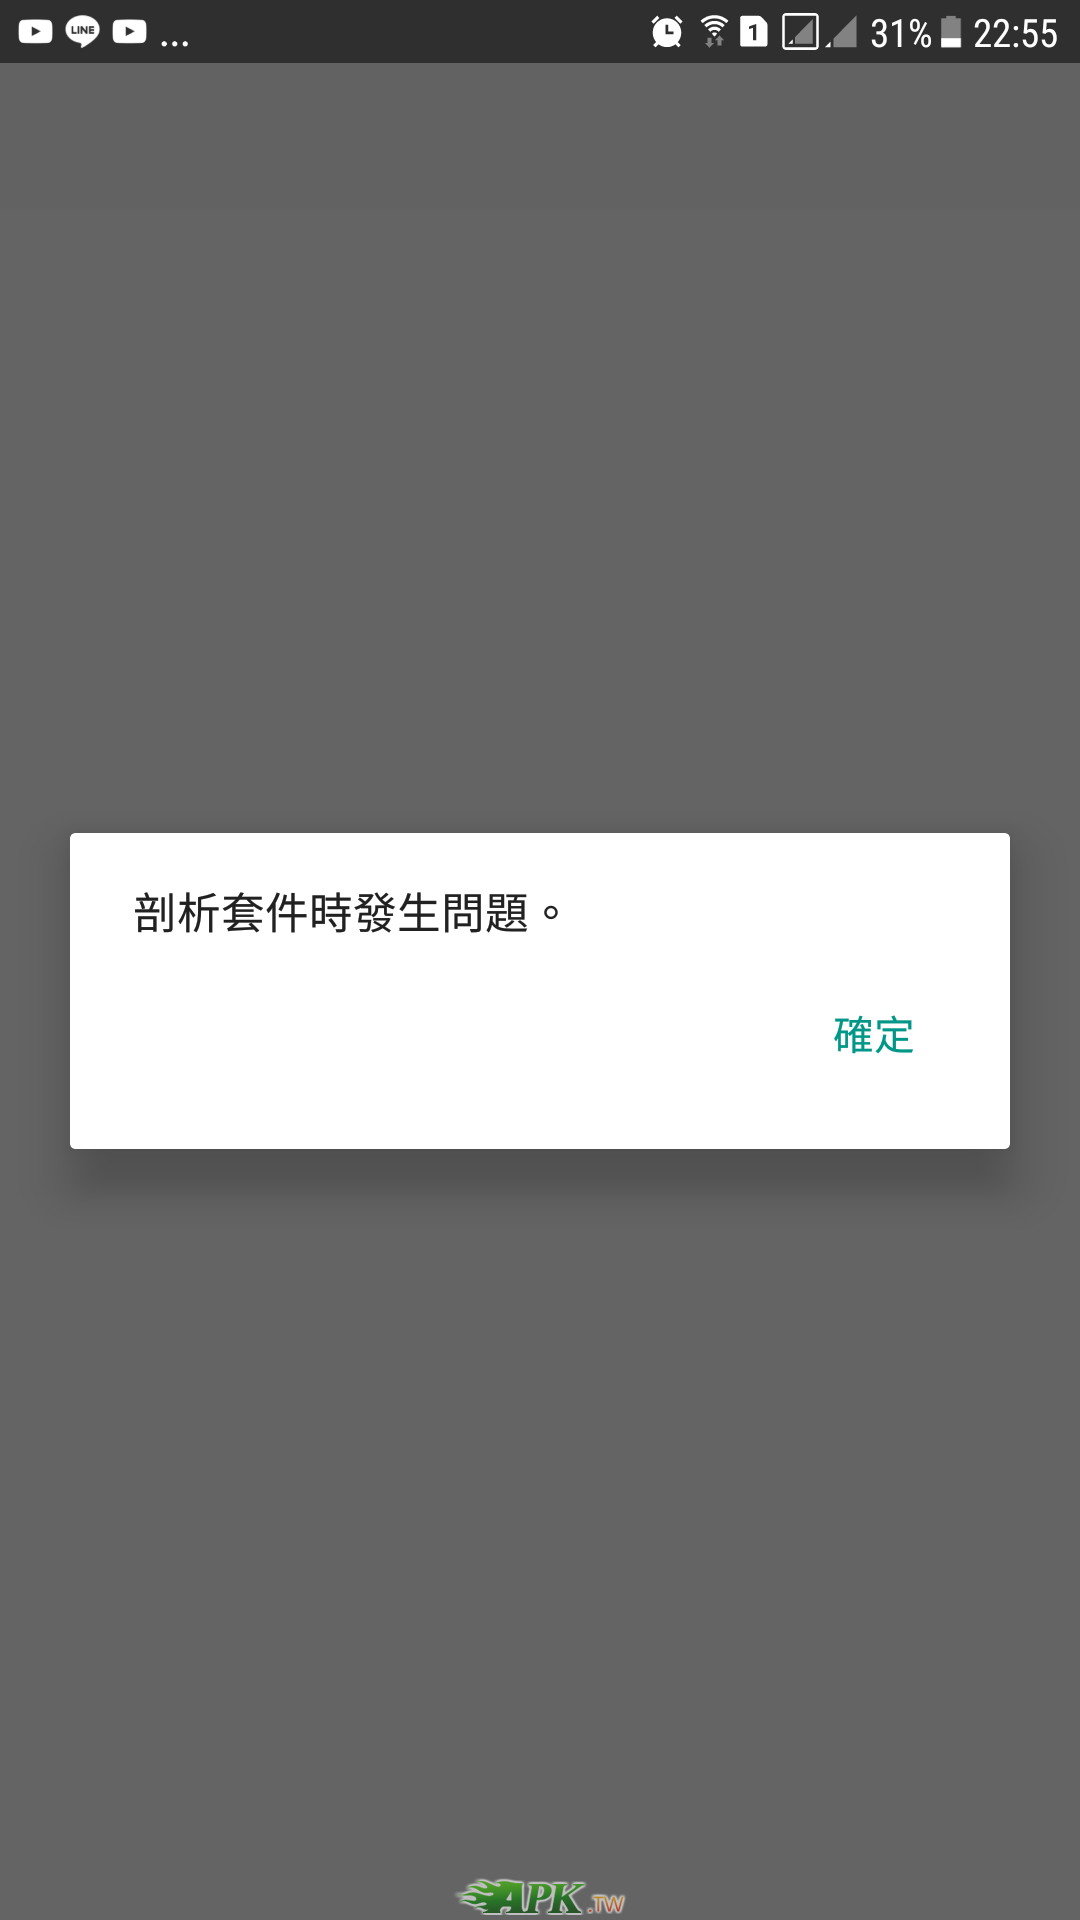 Screenshot_20190827-225537.png